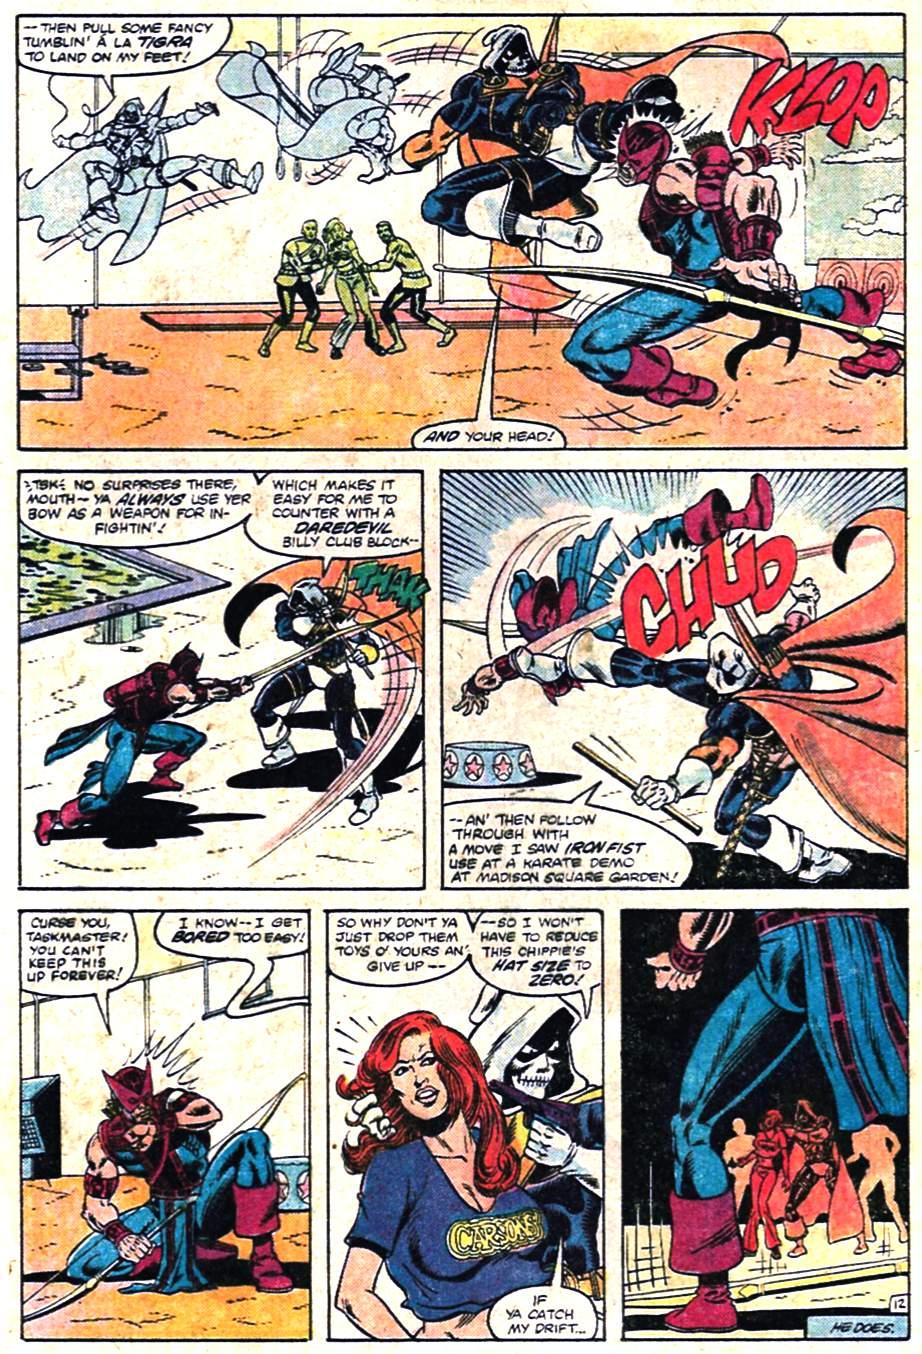 Hawkeye Vs Spiderman